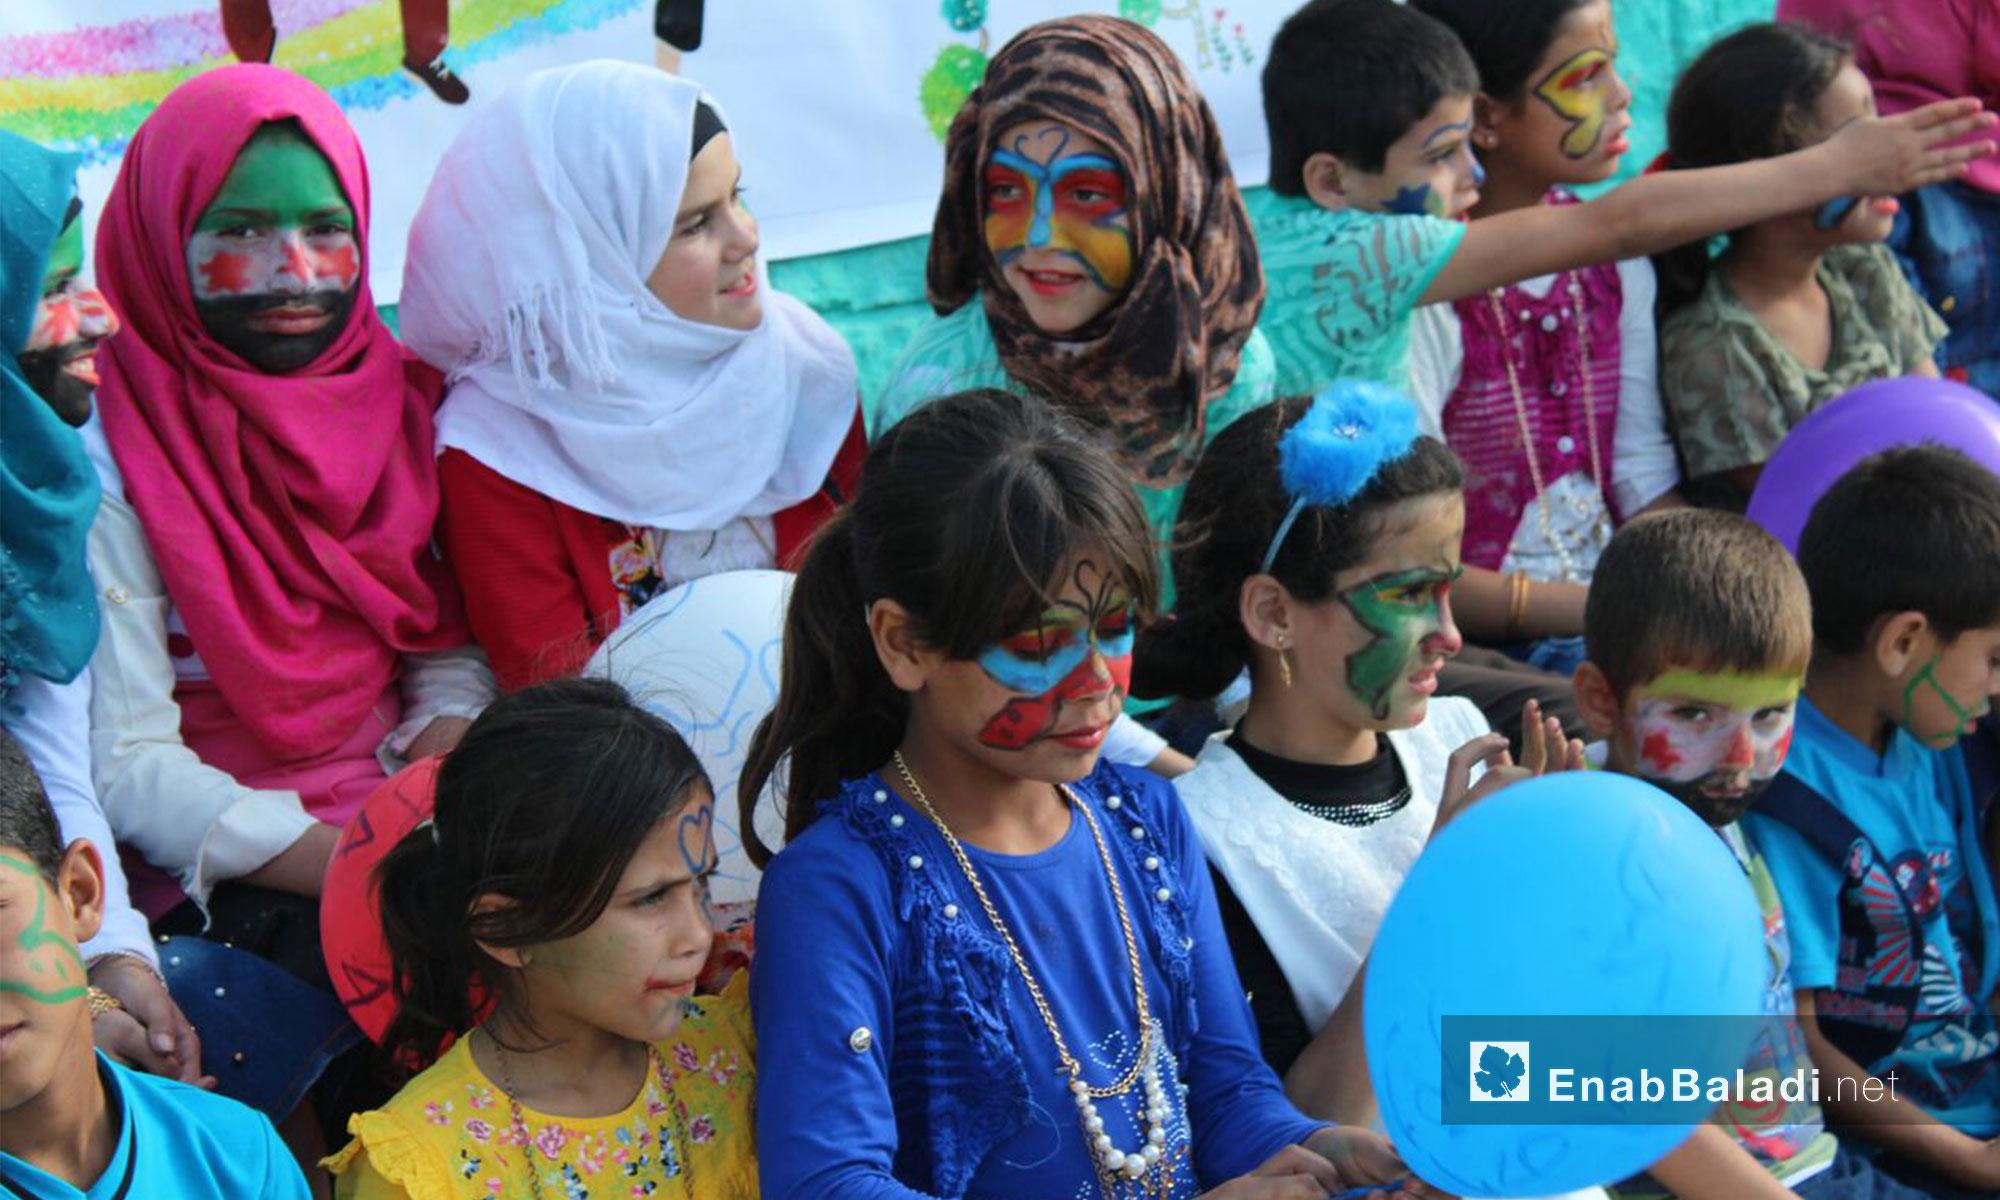 A carnival for children in celebration of Eid al-Fitr in rural Idlib's orphanage – June 17, 2018 (Enab Baladi)